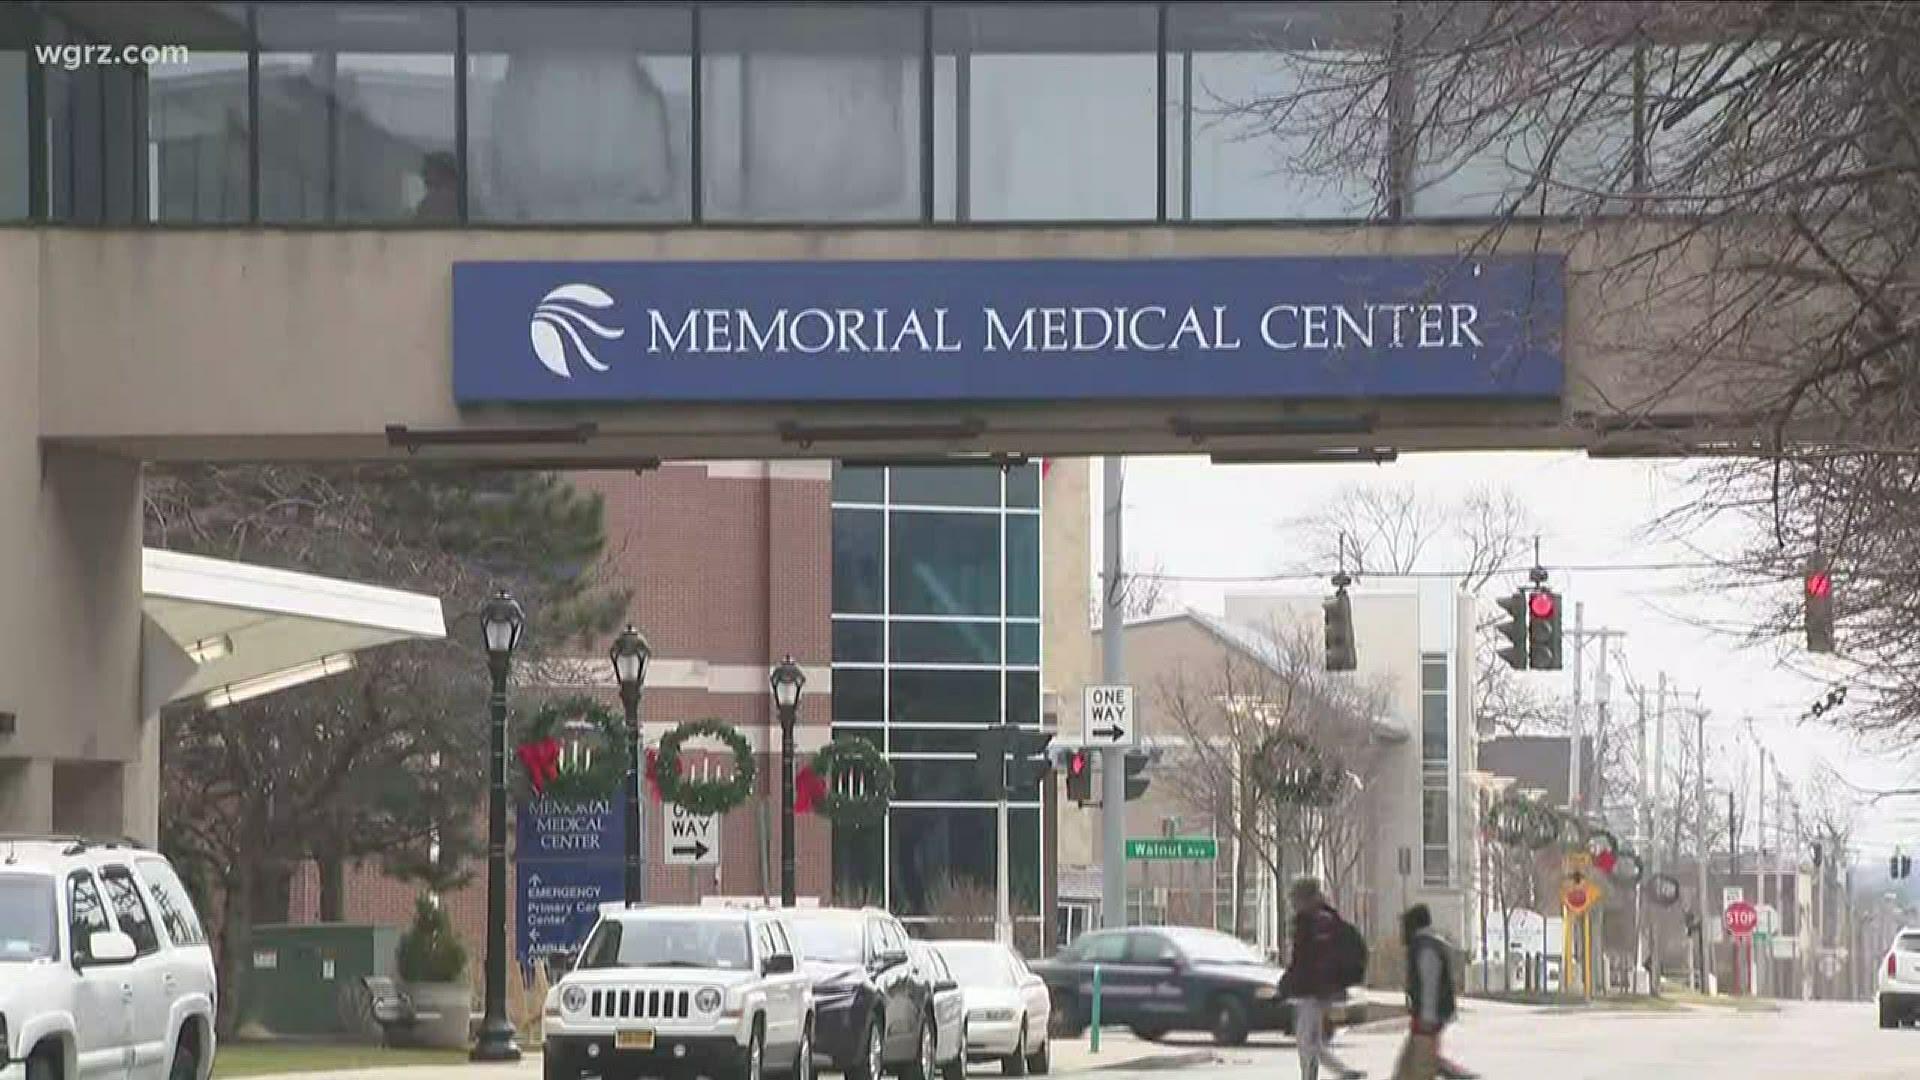 memorial medical center locations)